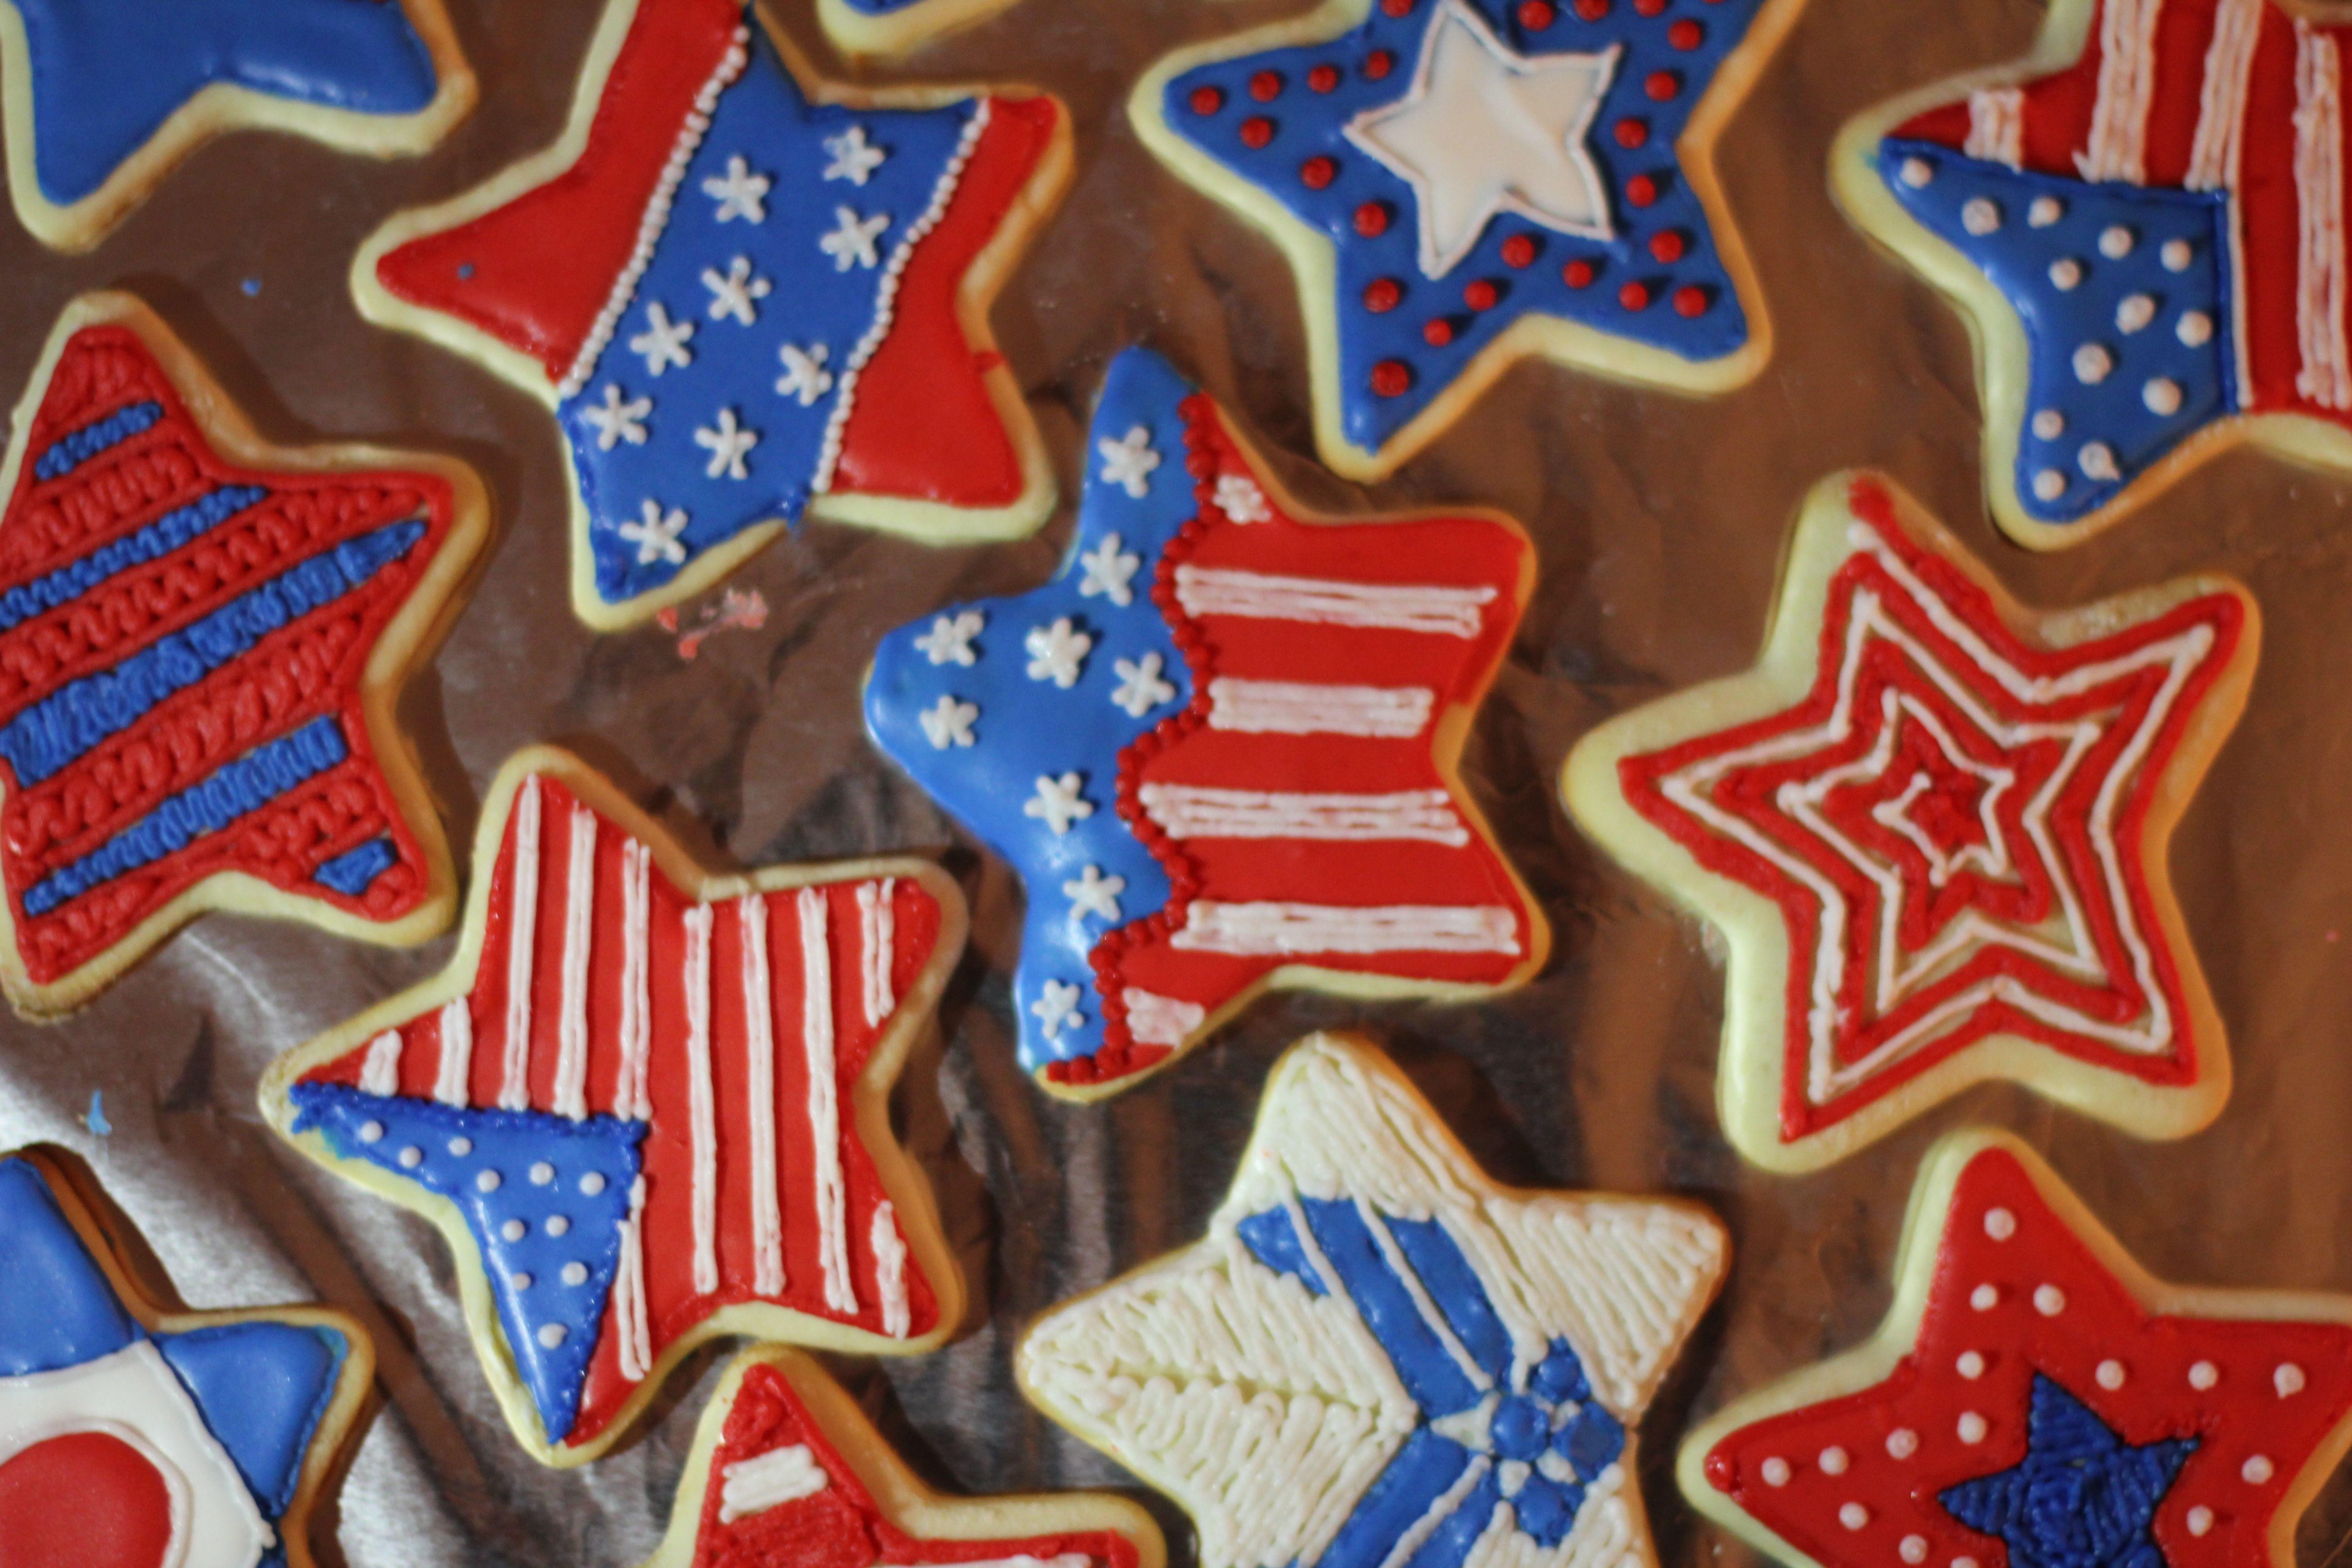 4Th Of July Sugar Cookies  4th of July Sugar Cookies